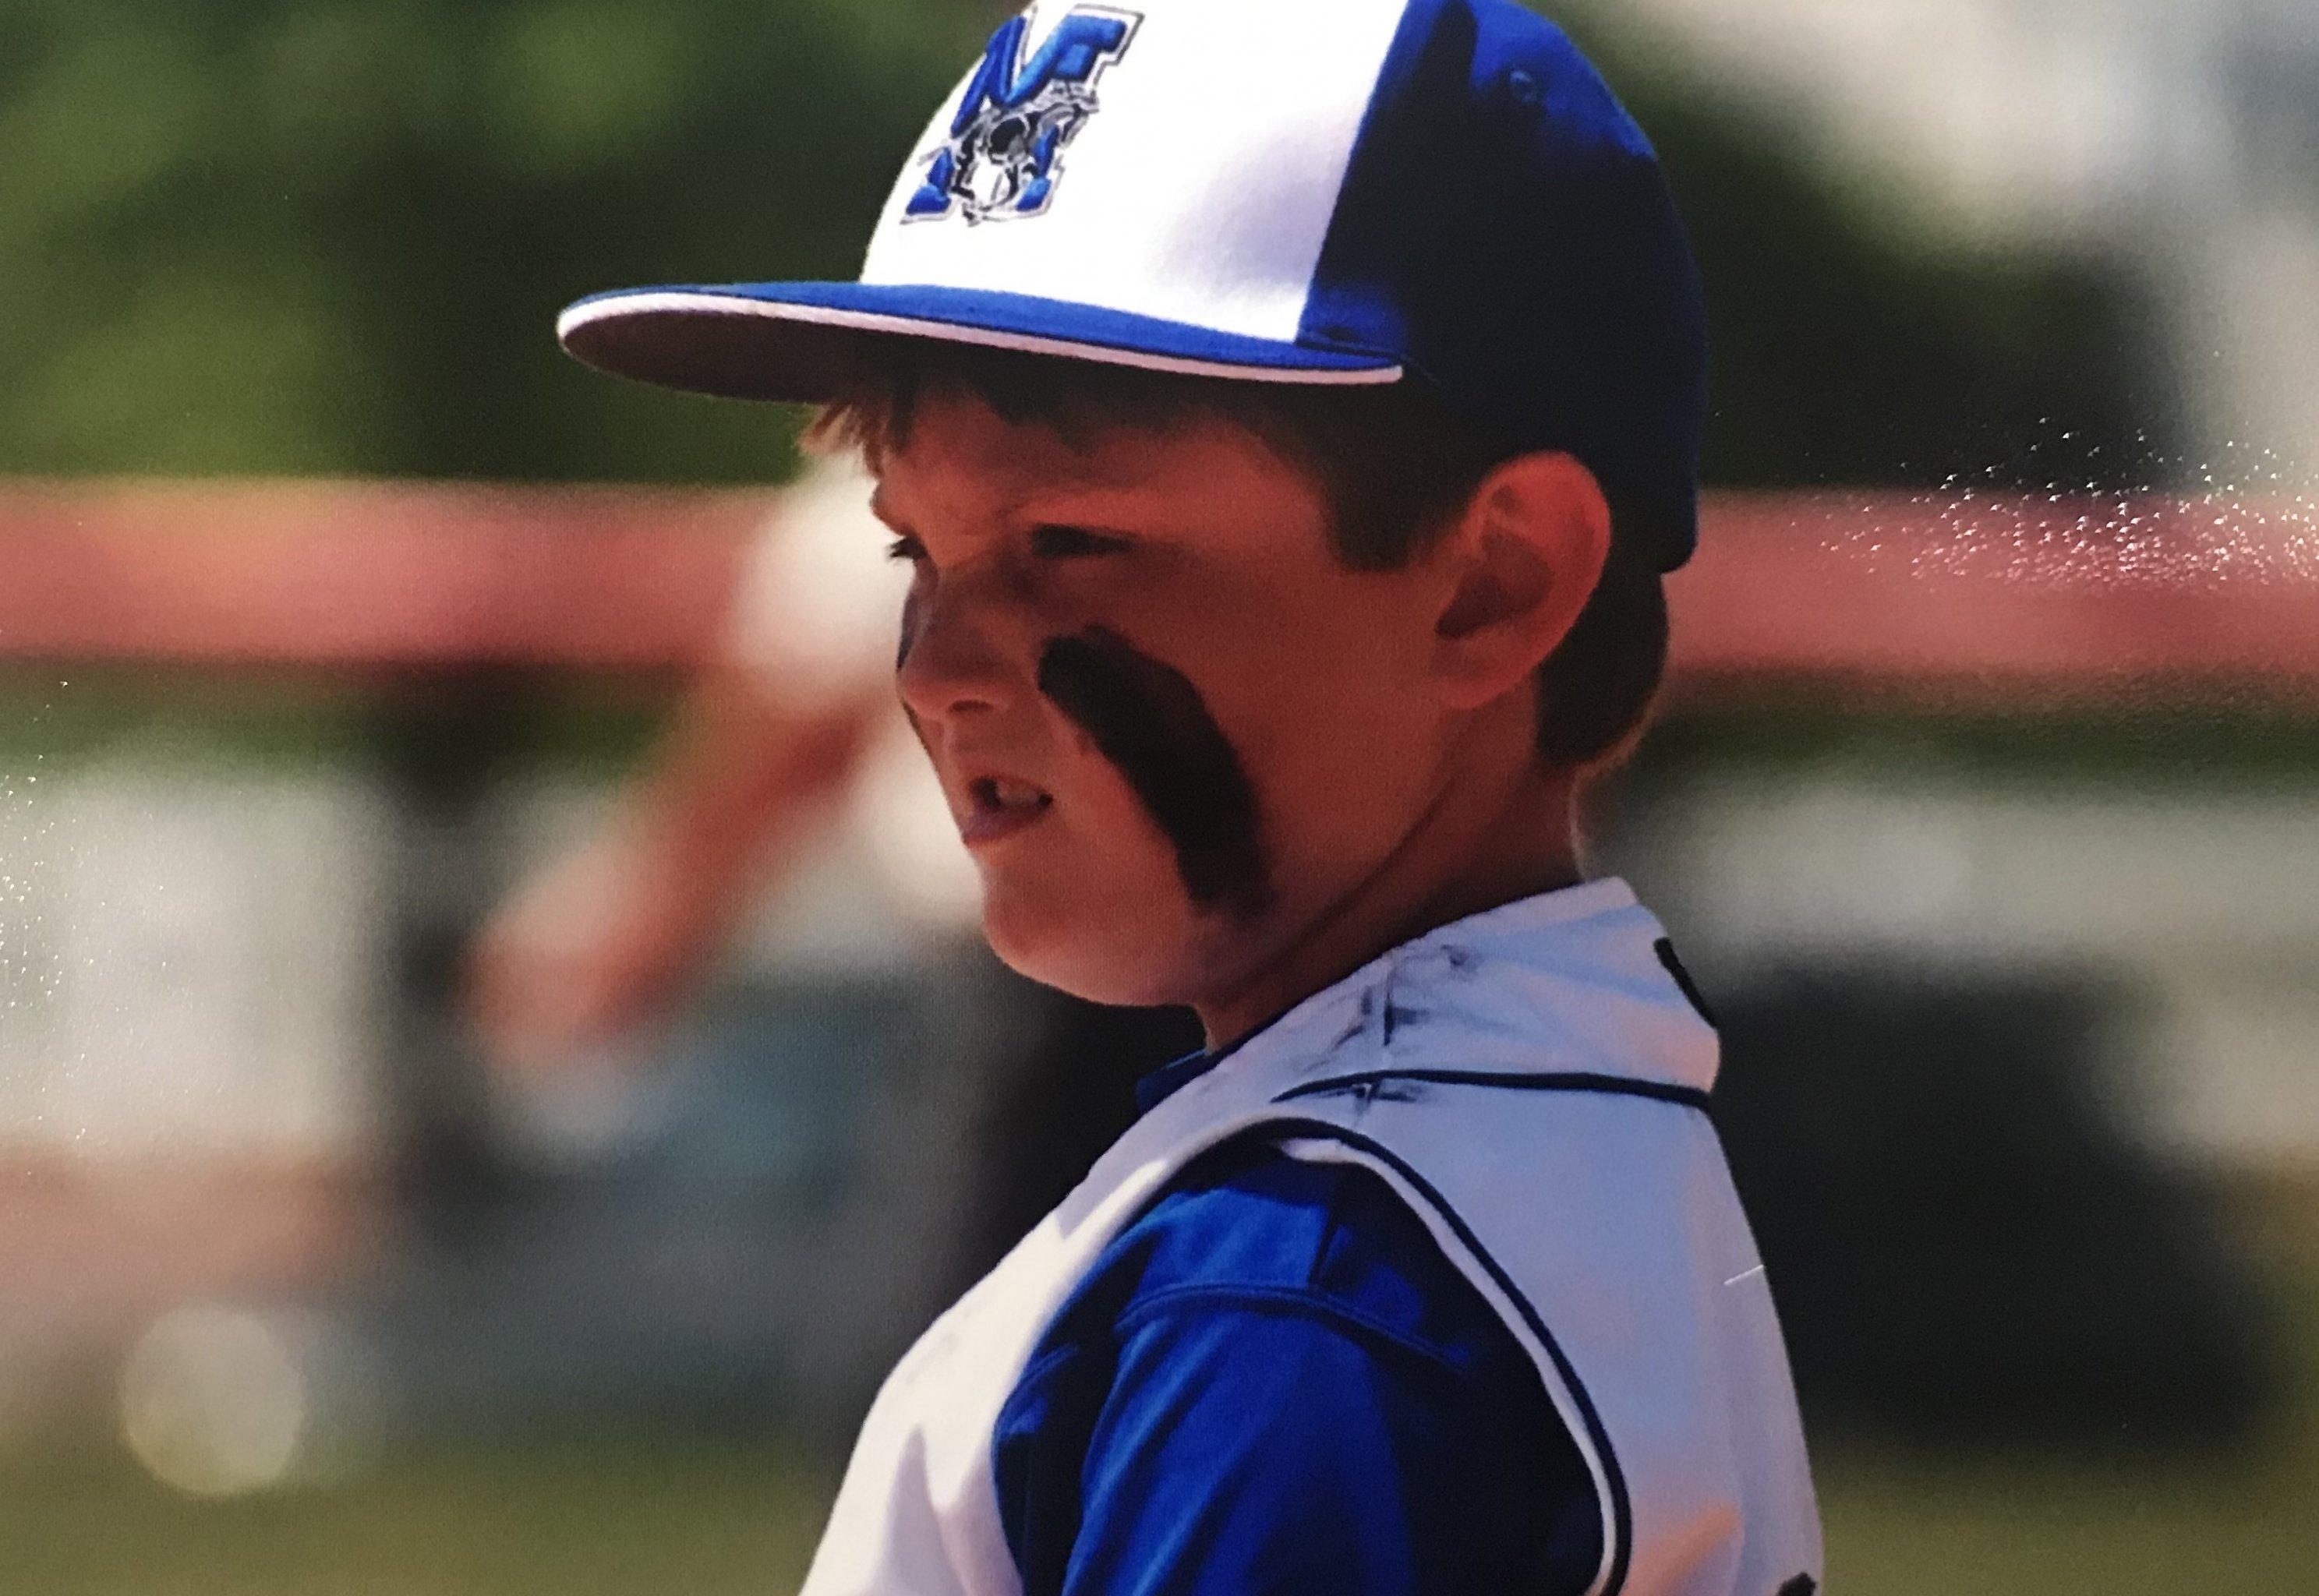 Meet Blaze Jordan: The 15-Year-Old Baseball Phenom with 500